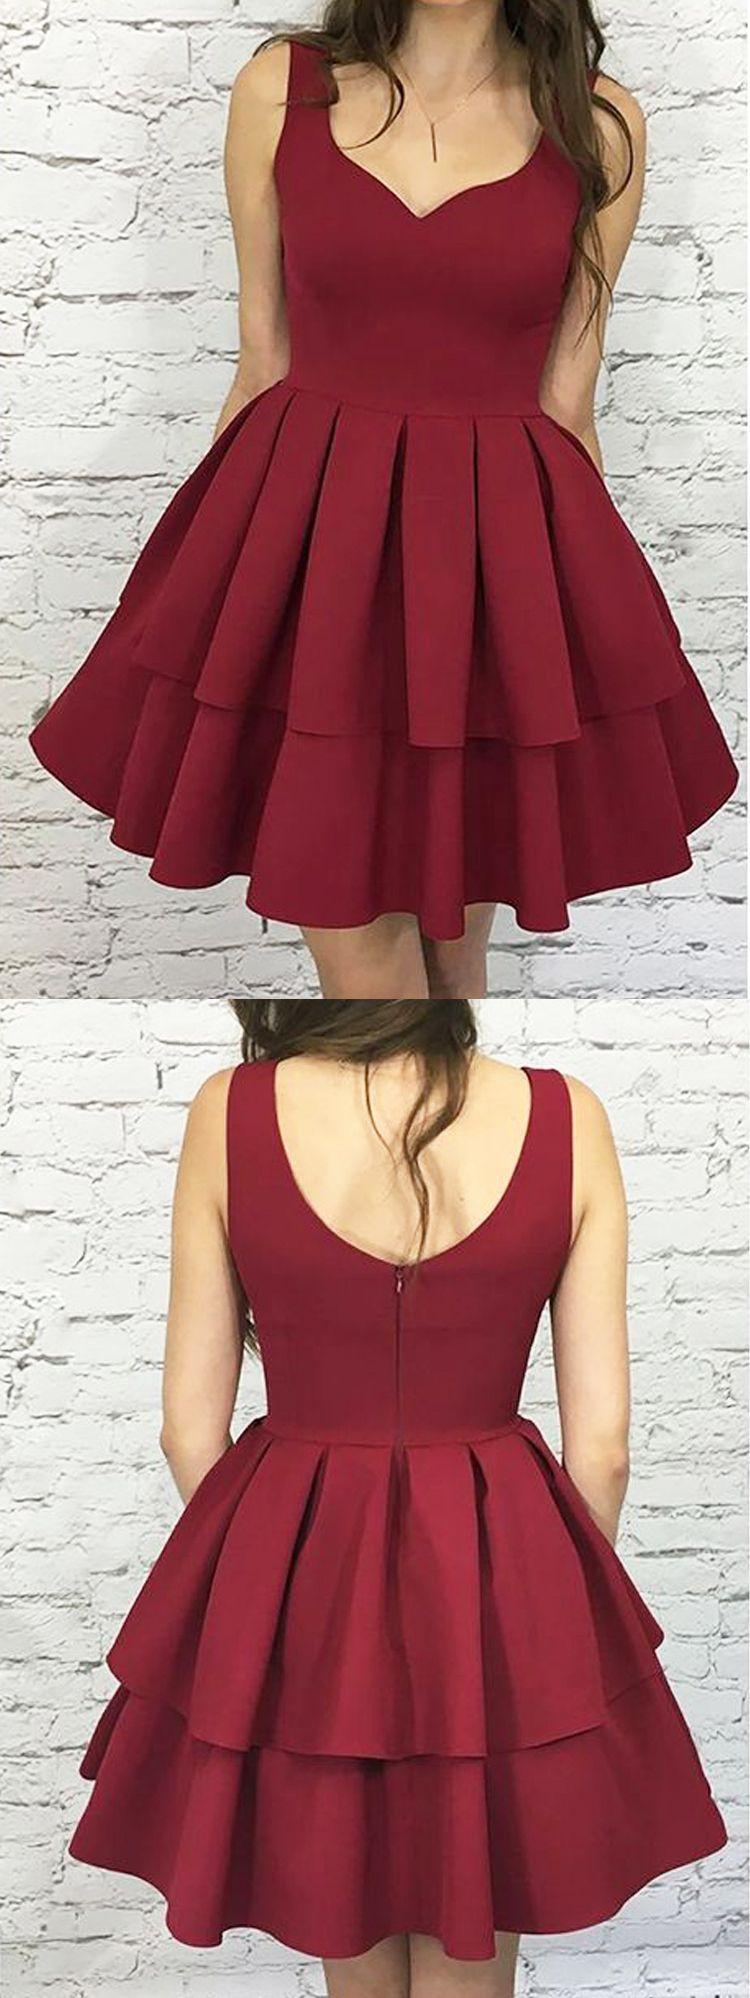 Cute a line v neck open back satin burgundy short homecoming dresses